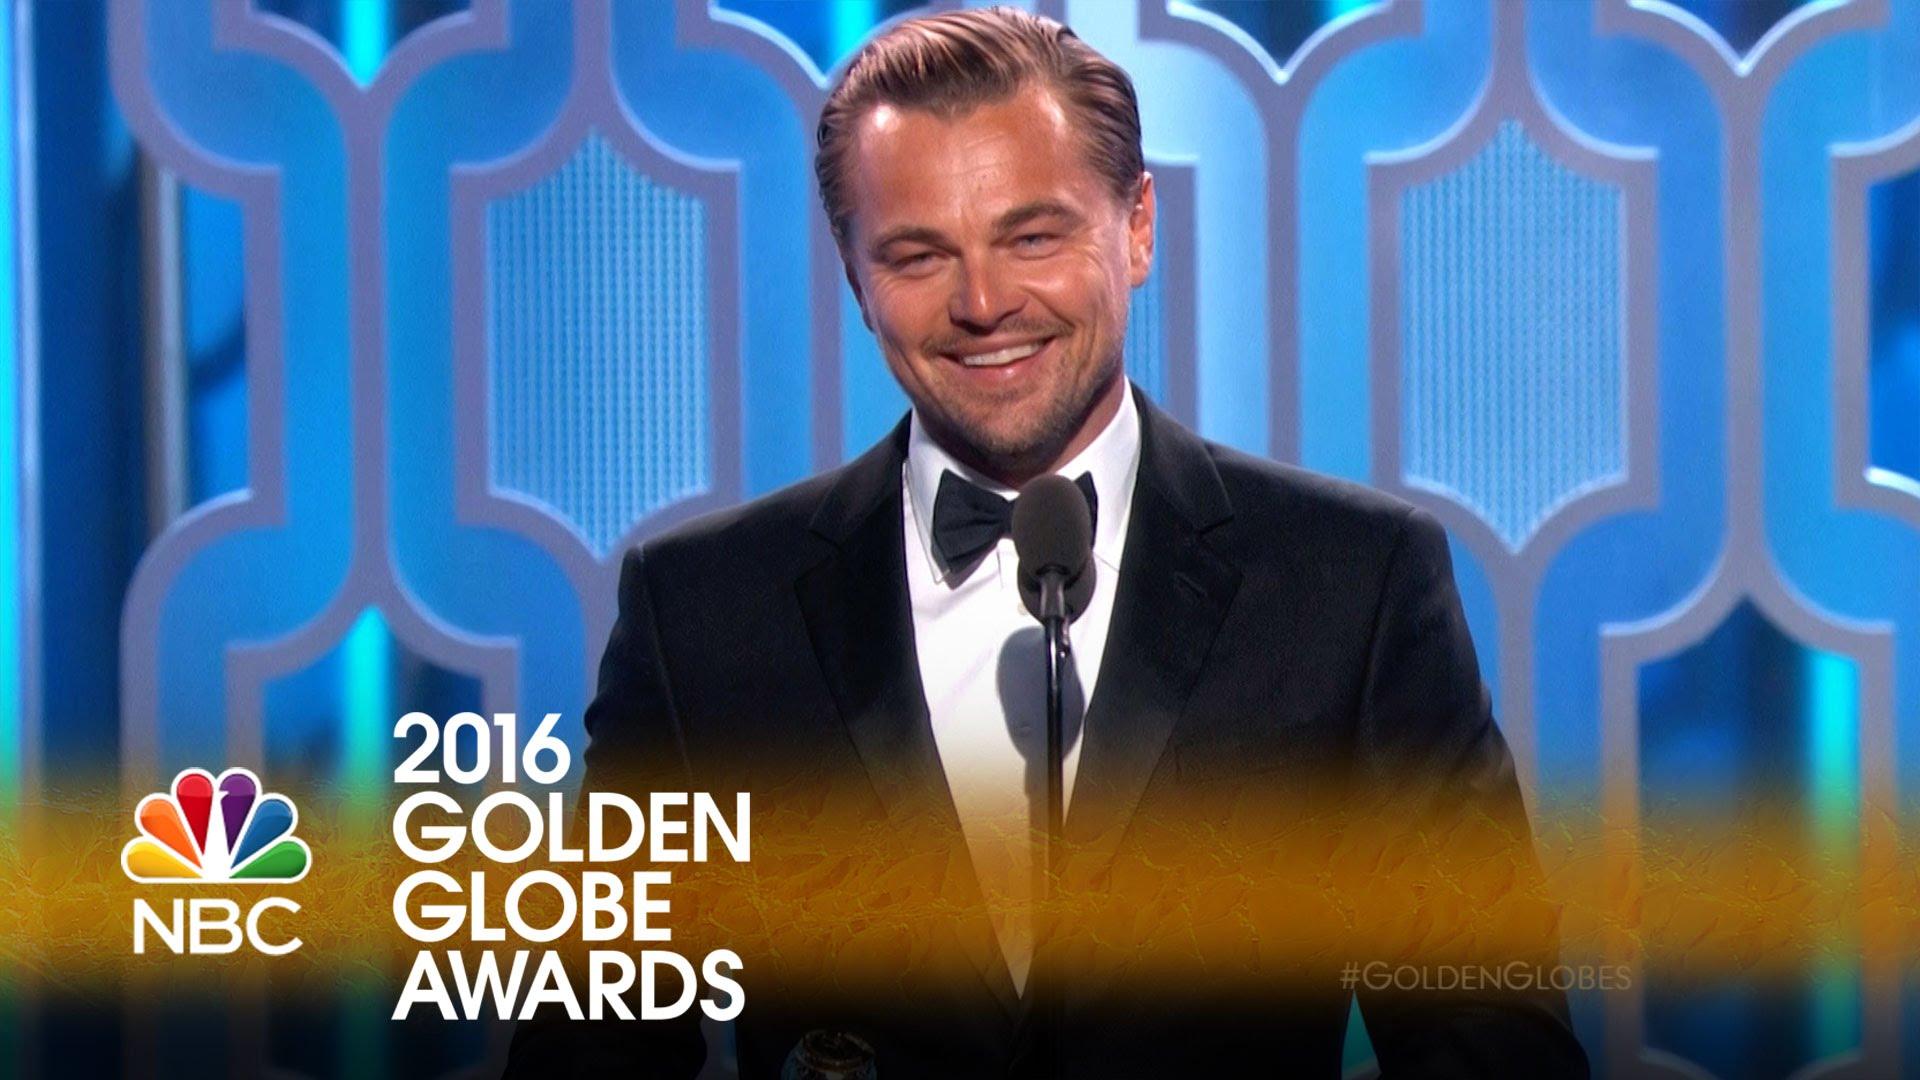 Golden Globe 2016